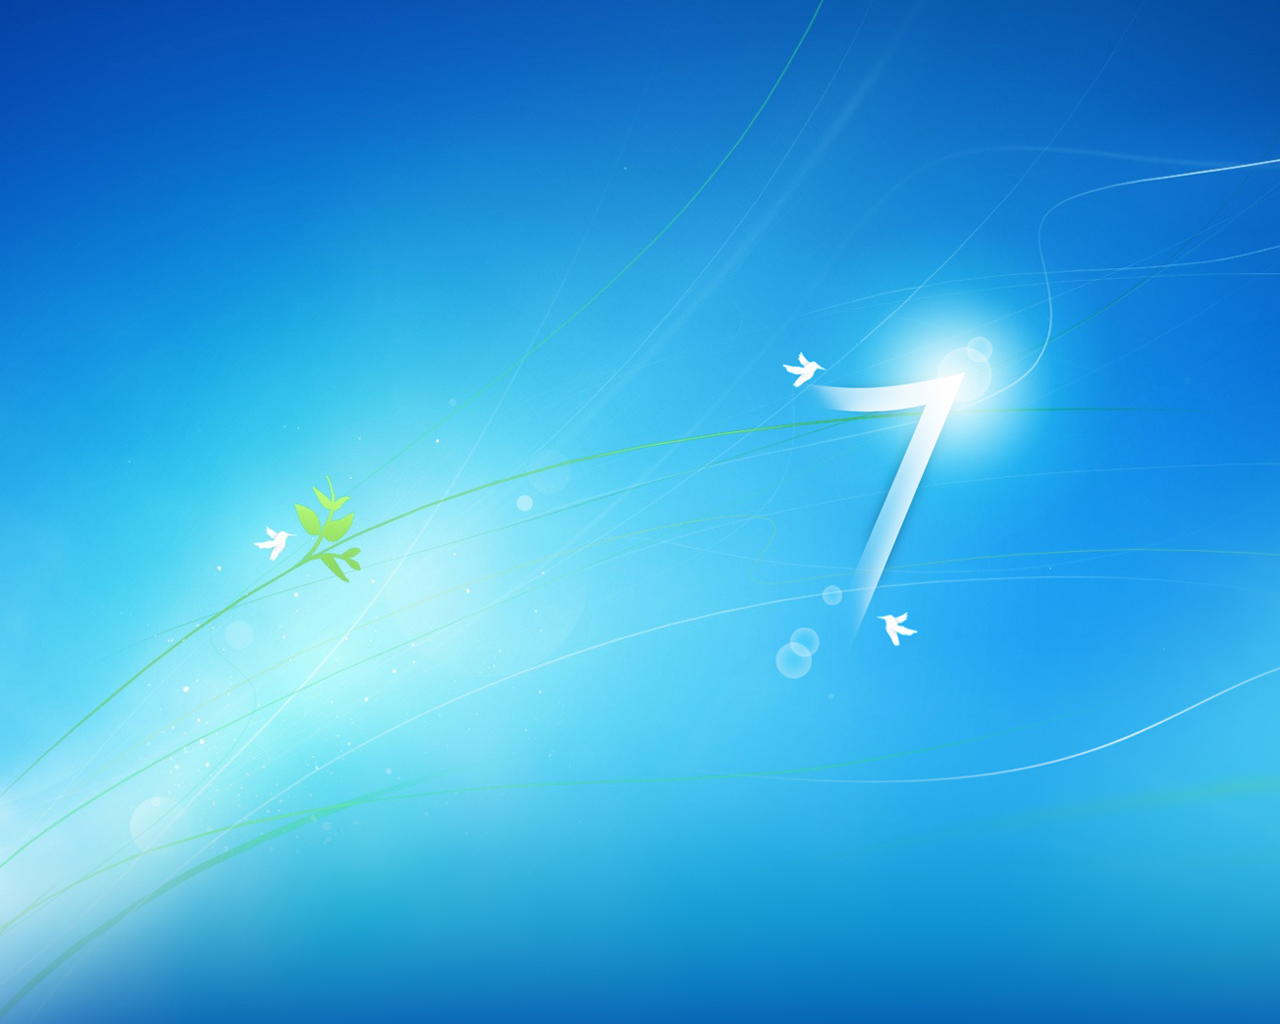 http://2.bp.blogspot.com/-LFwH7O-v1f0/TzeUF00jCtI/AAAAAAAAFaw/OOdwe-nxr9M/s1600/Windows+7+Wallpapers+4.jpg